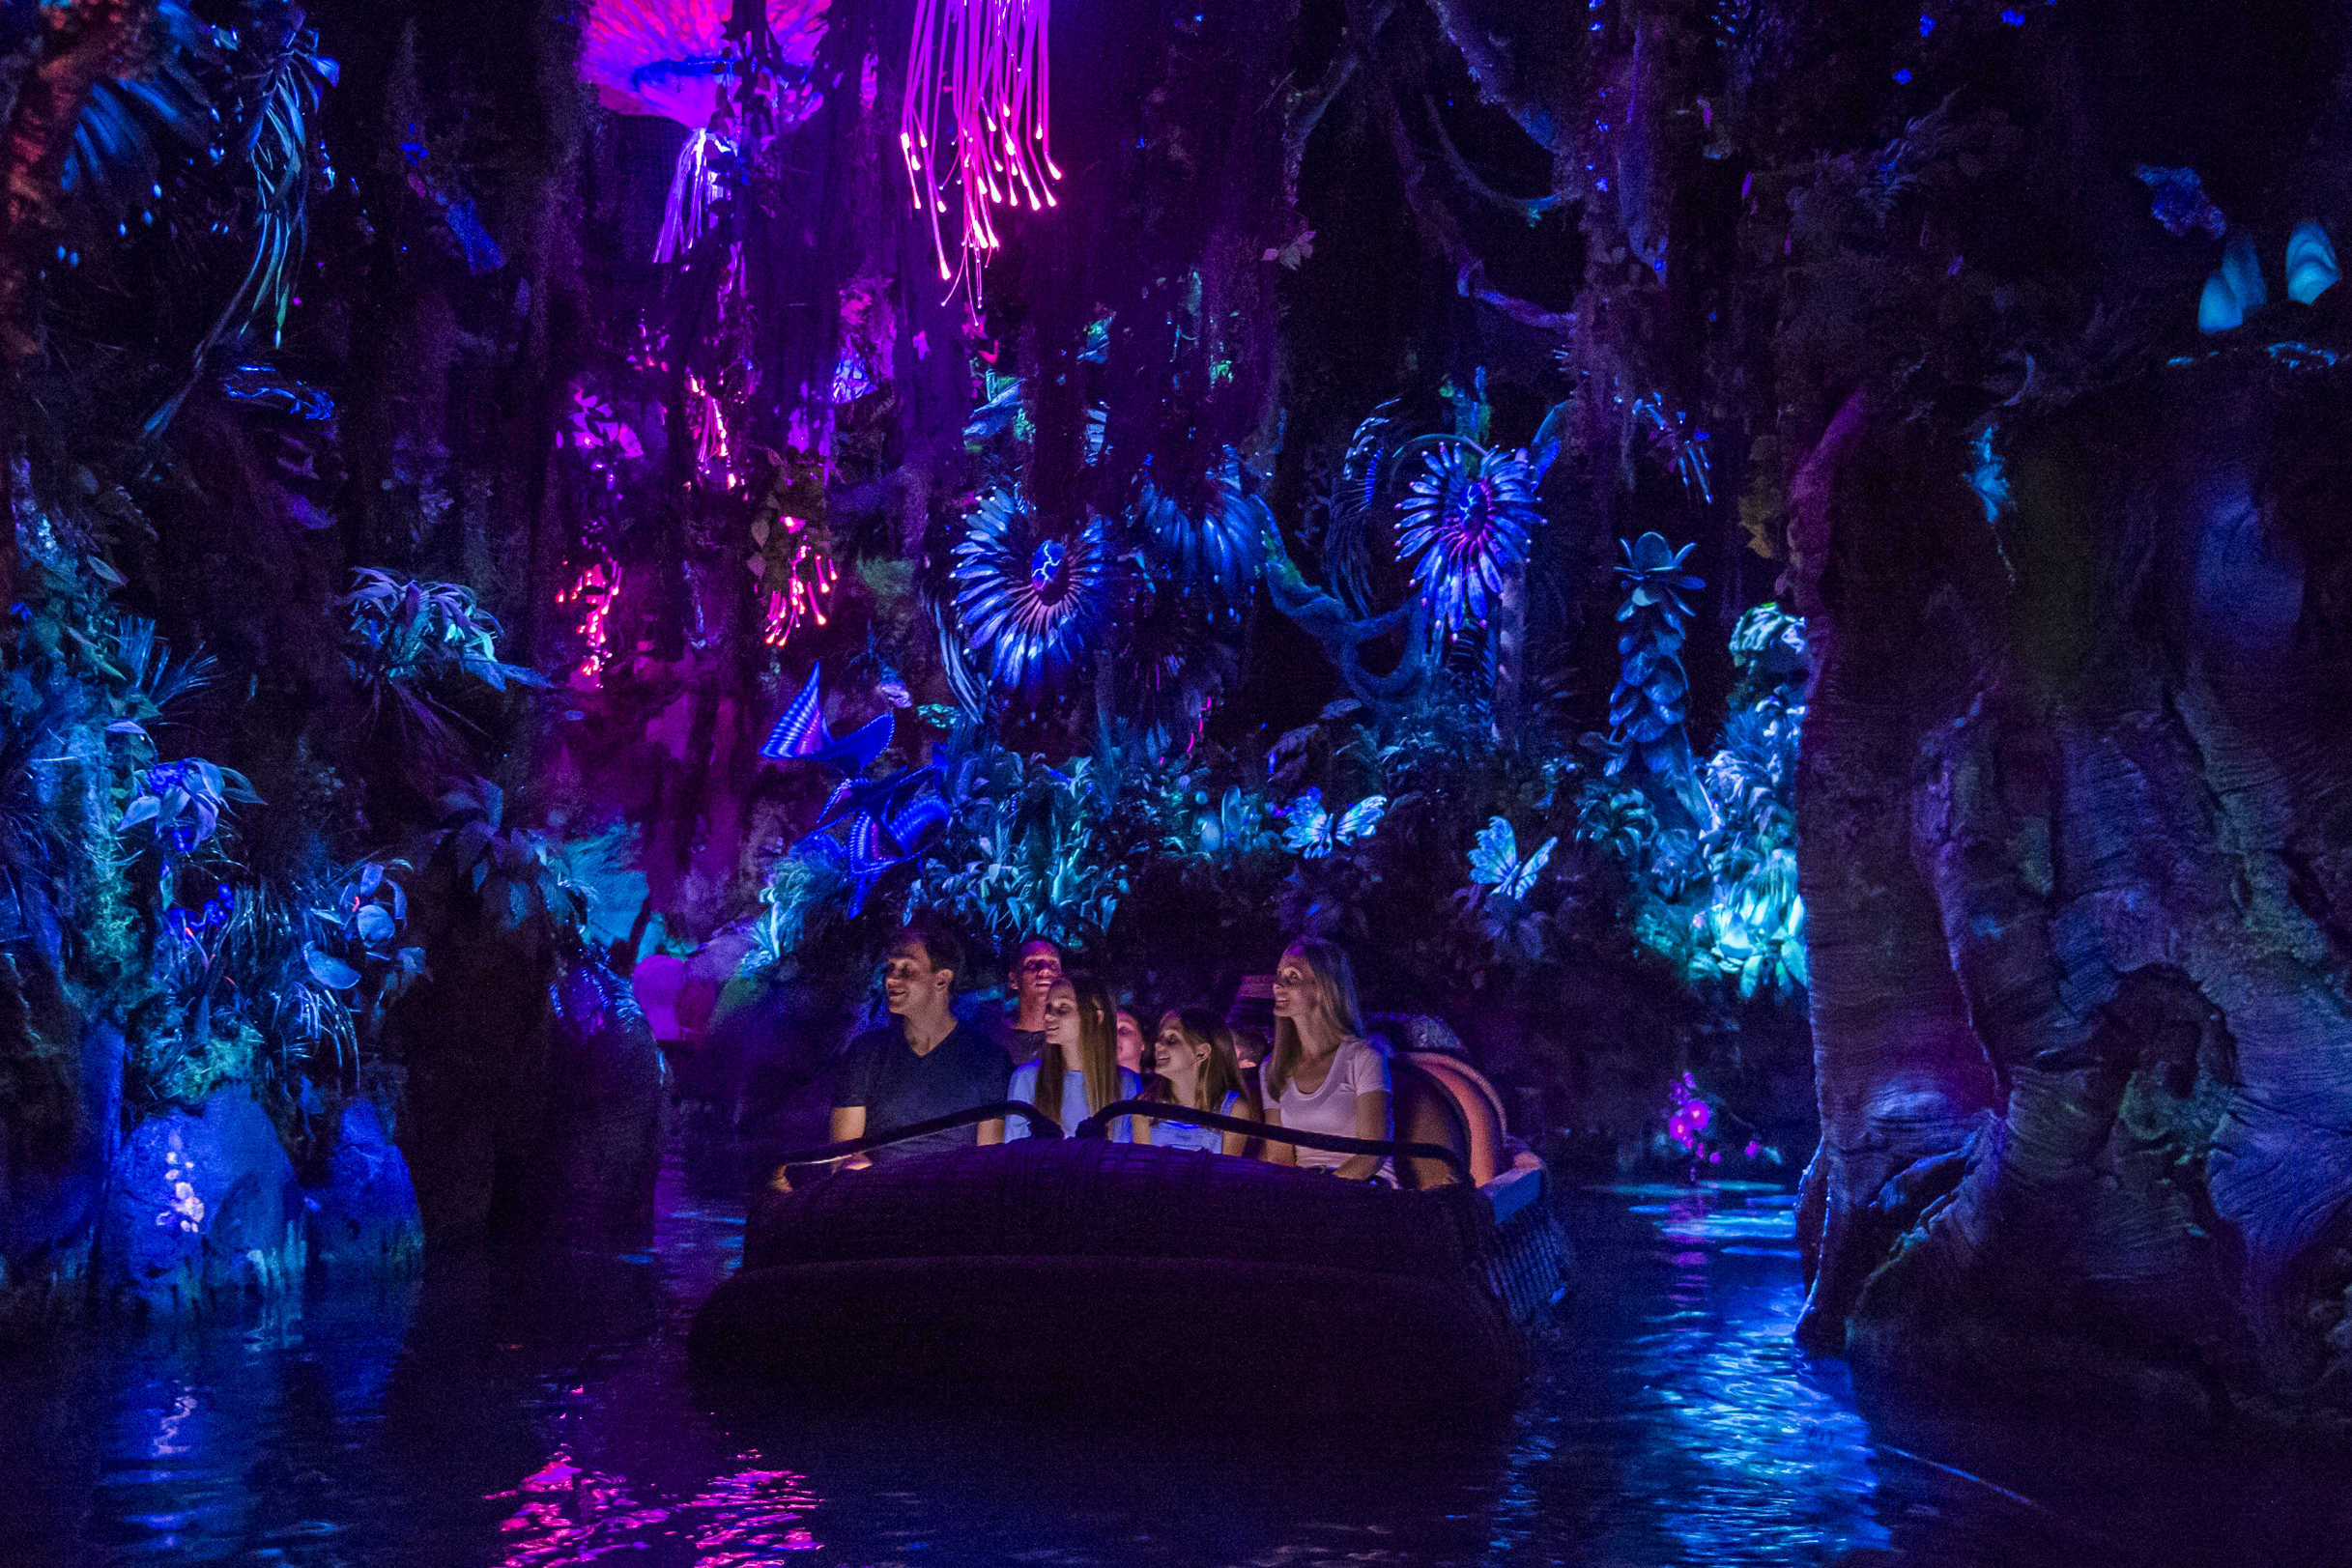 NaÕvi River Journey at Pandora Ð The World of AVATAR at Disney's Animal Kingdom